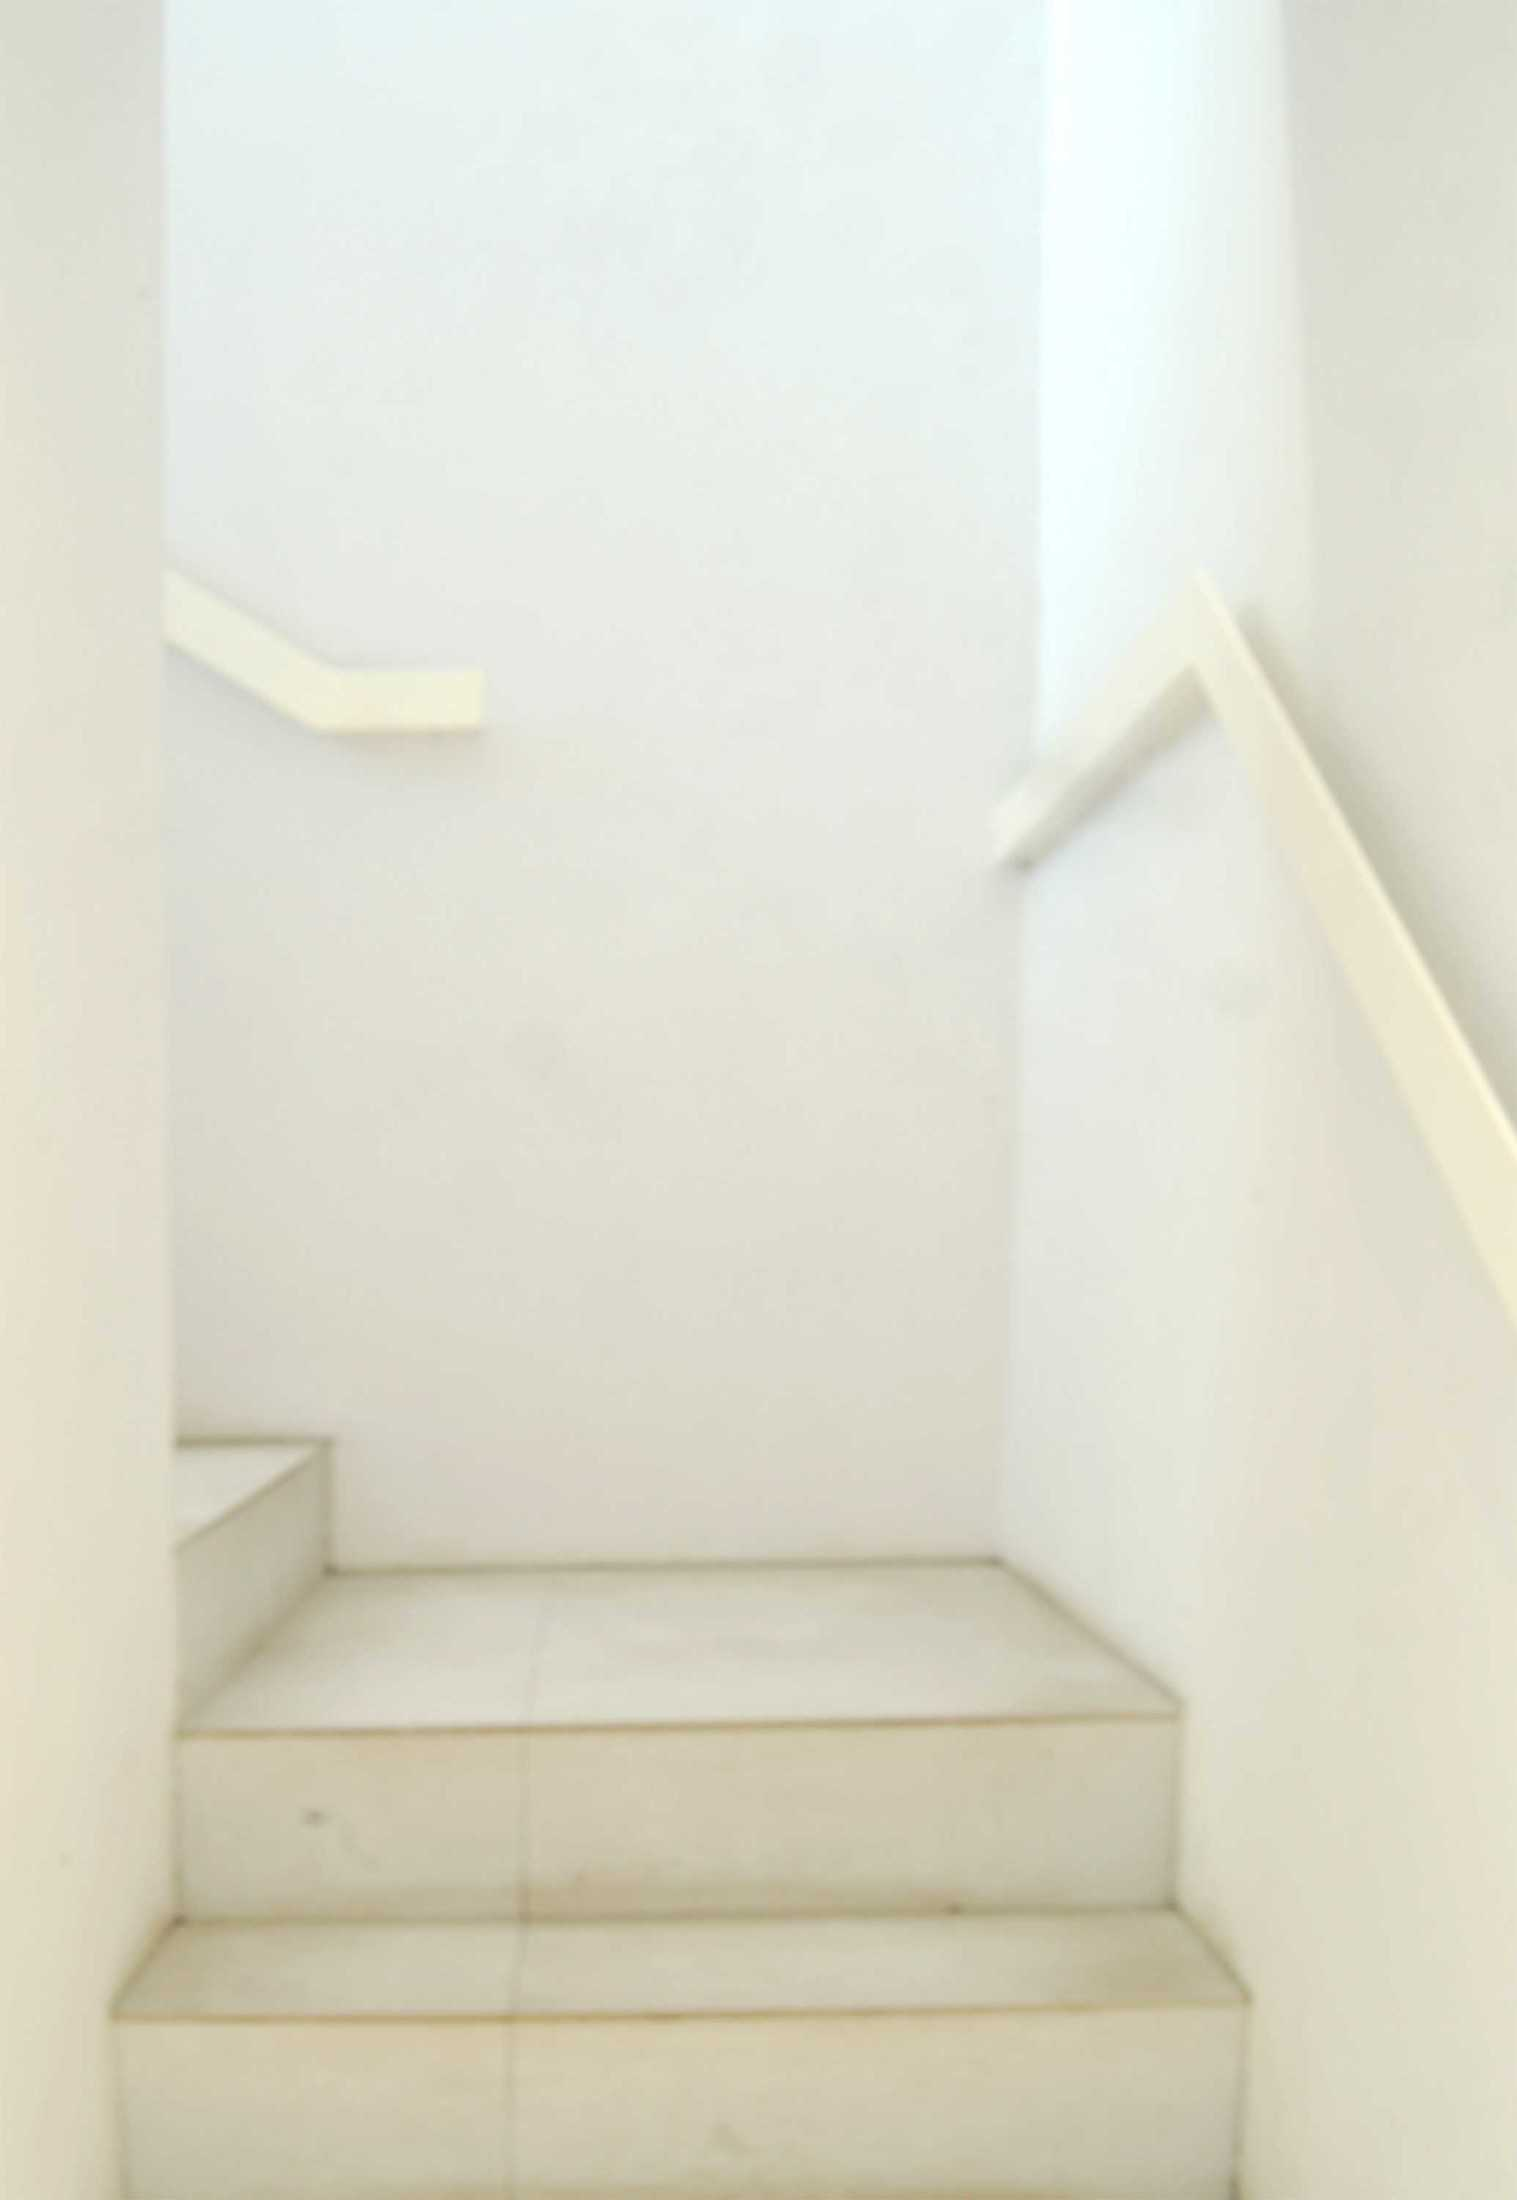 Ads Architect Kafe Kotak Putih Sentul Selatan Sentul Selatan Ads-Architect-Kafe-Kotak-Putih  53524